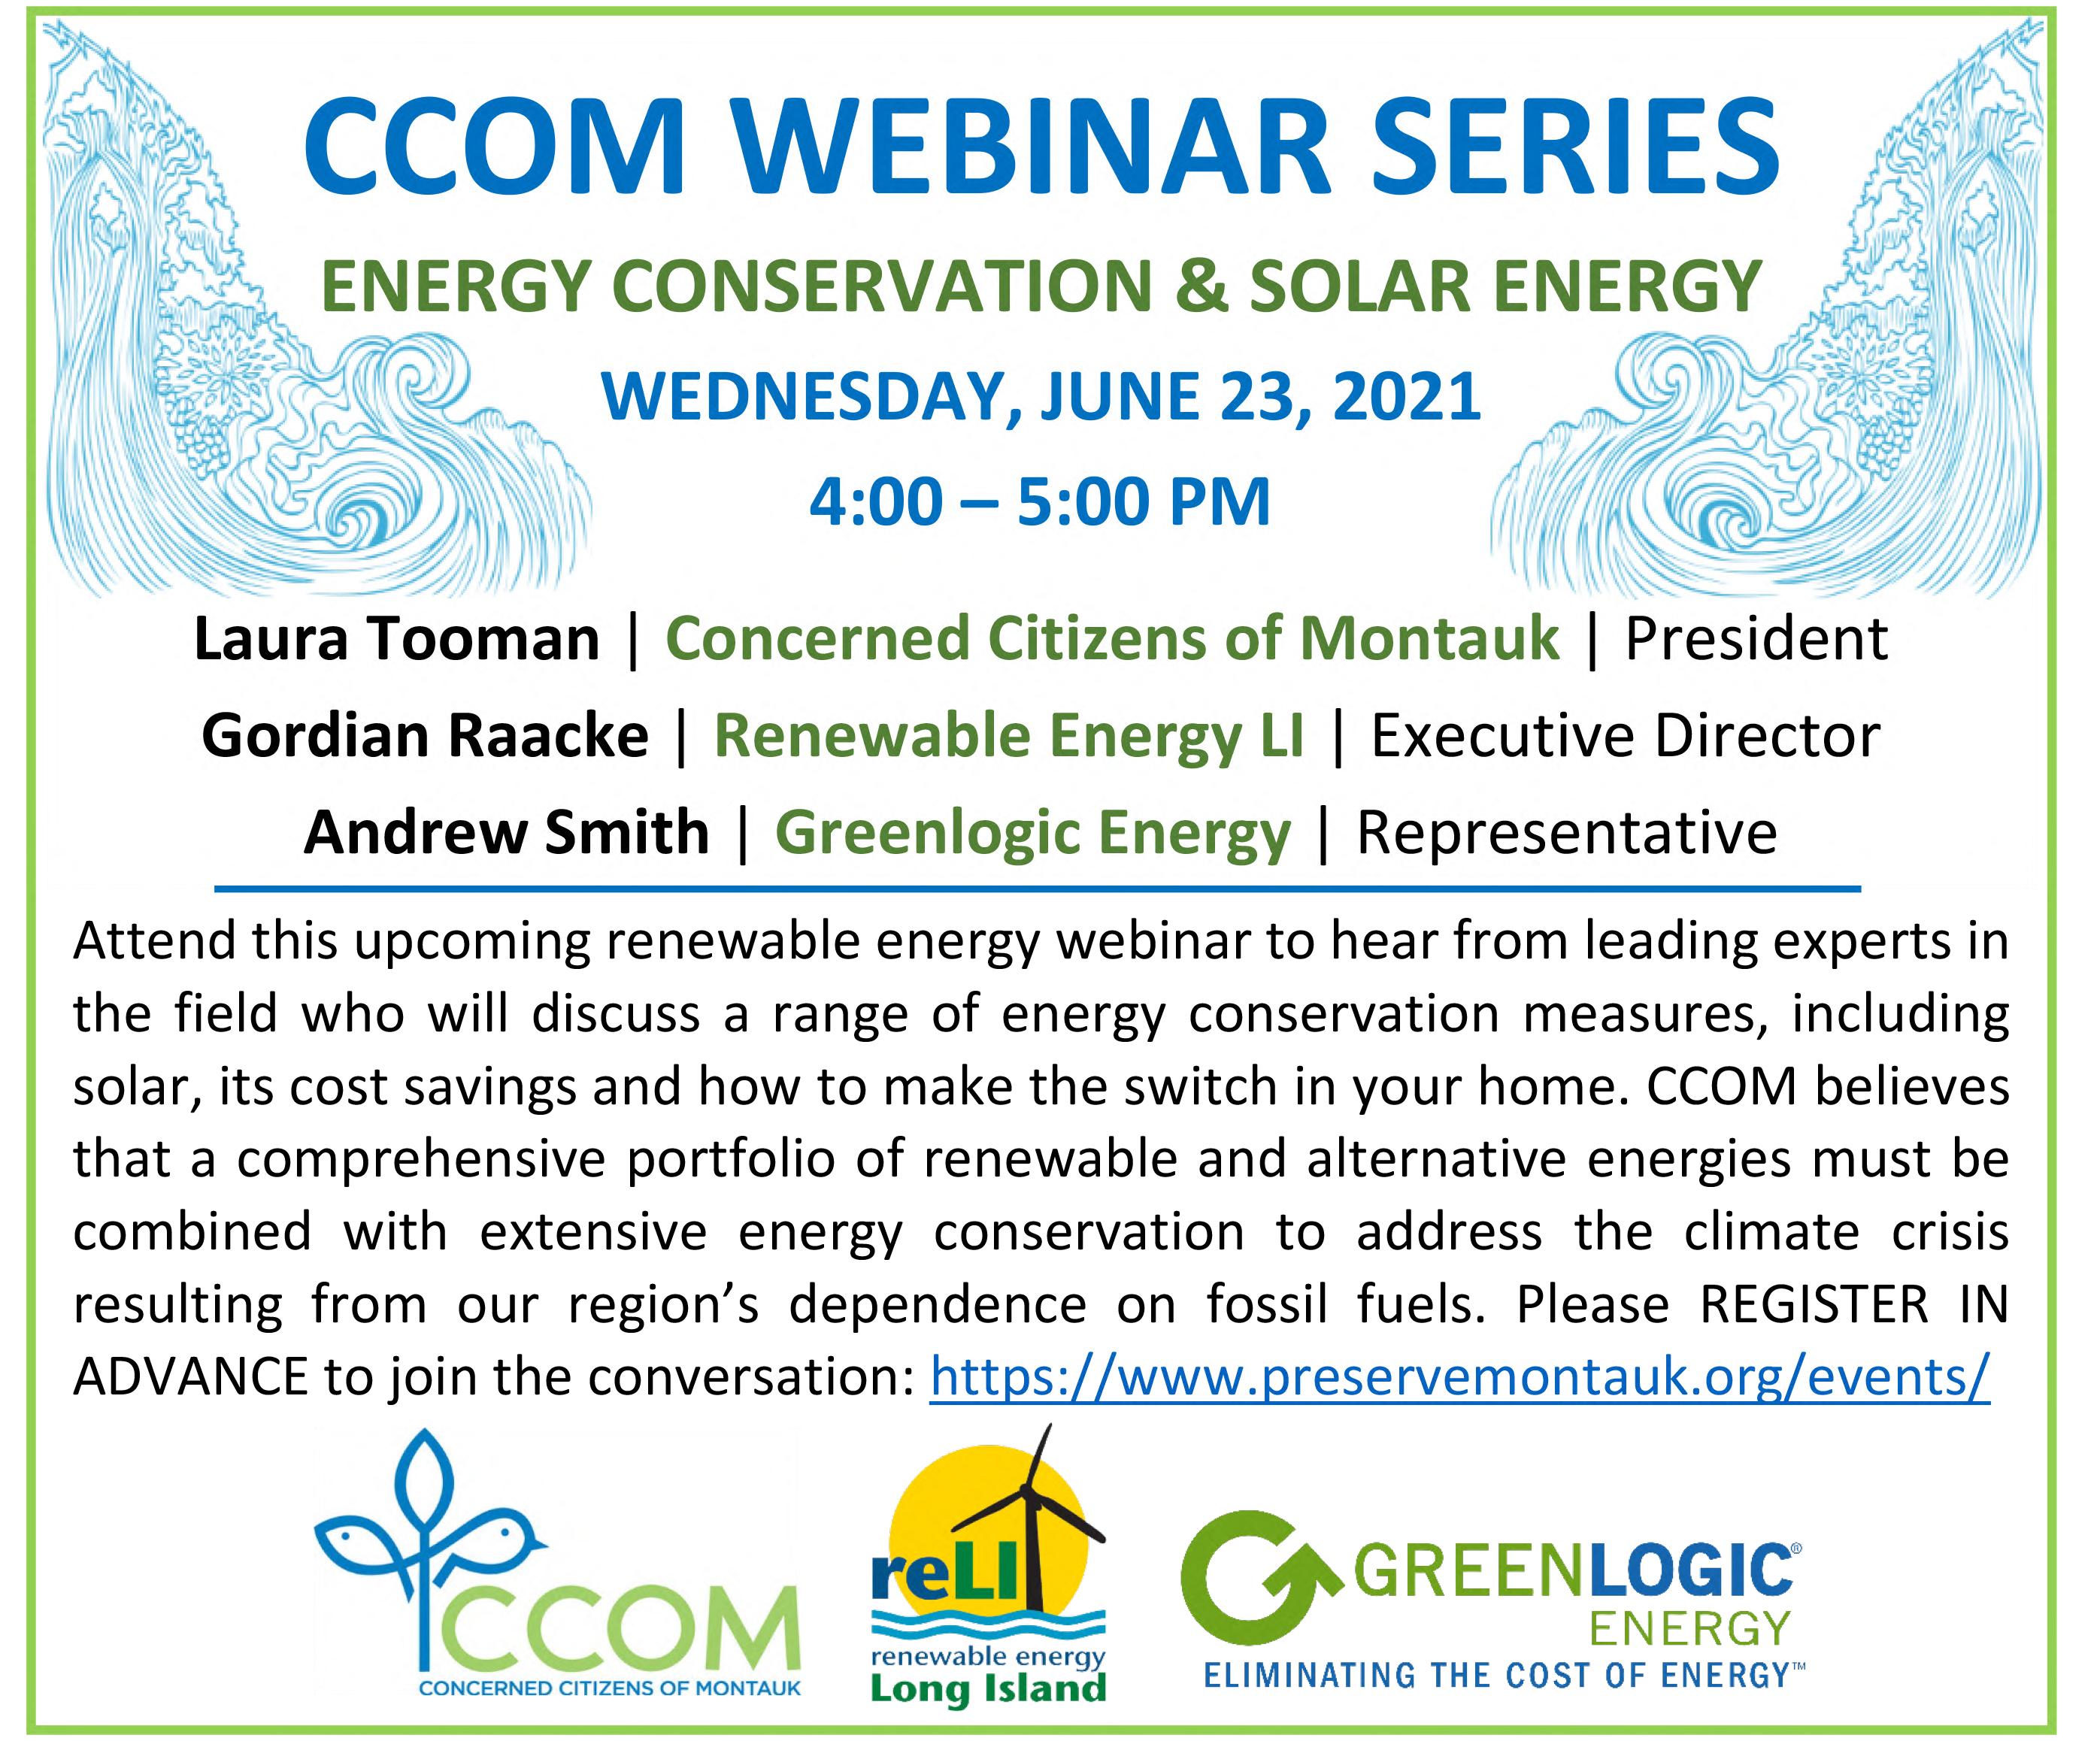 CCOM_Energy_Webinar_Flyer.png